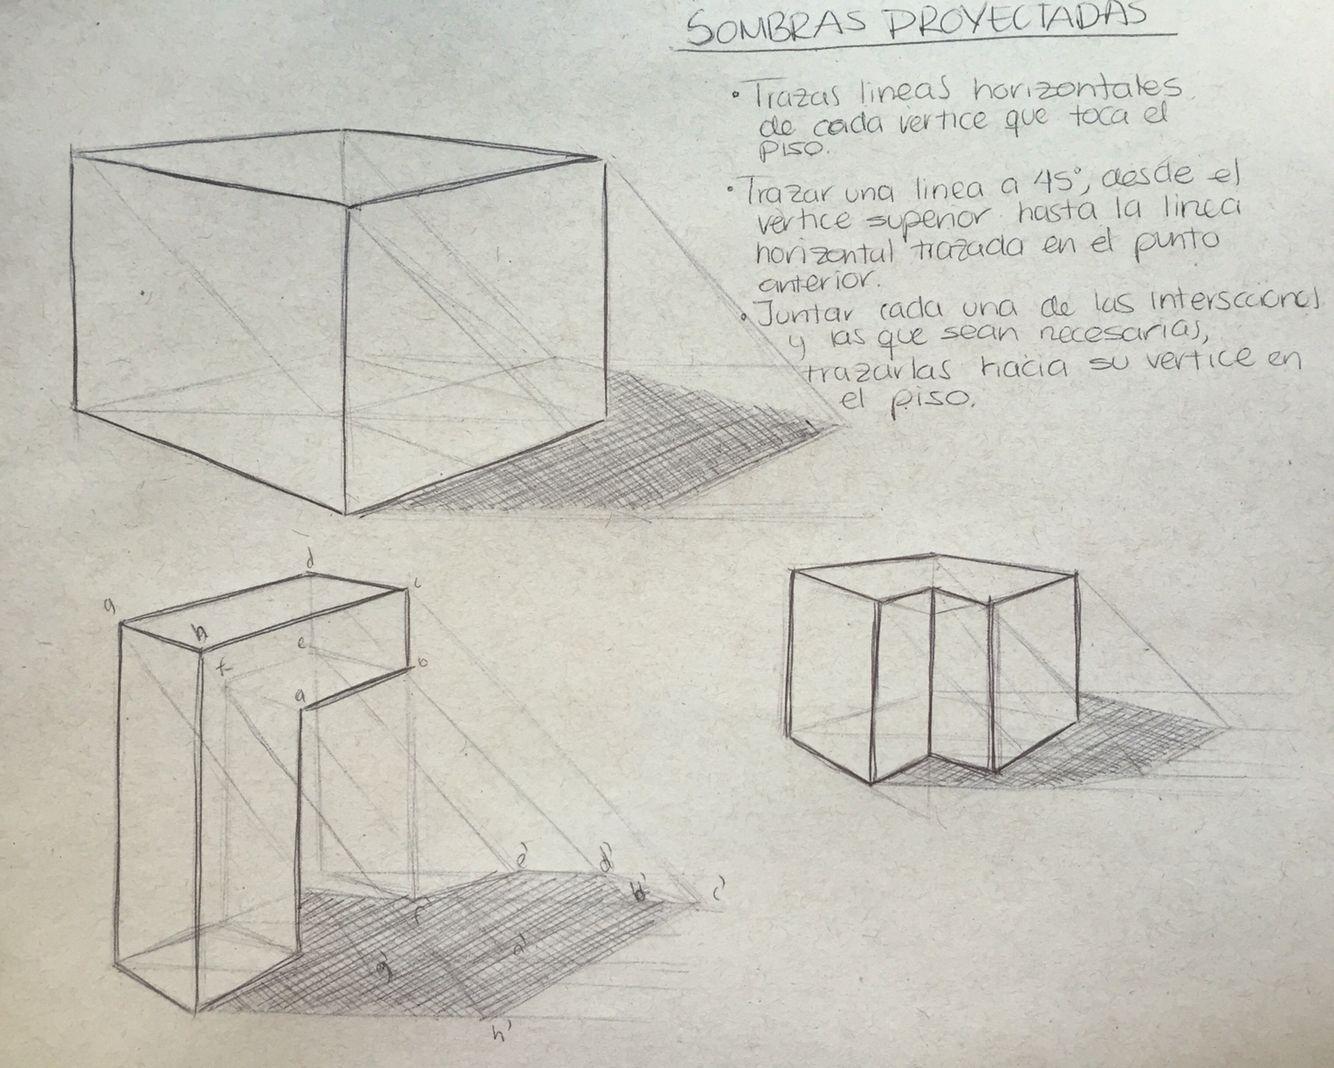 Sombras Proyectadas A 45 Grados Luz Y Sombra Dibujo Sombra Proyectada Geometria Descriptiva